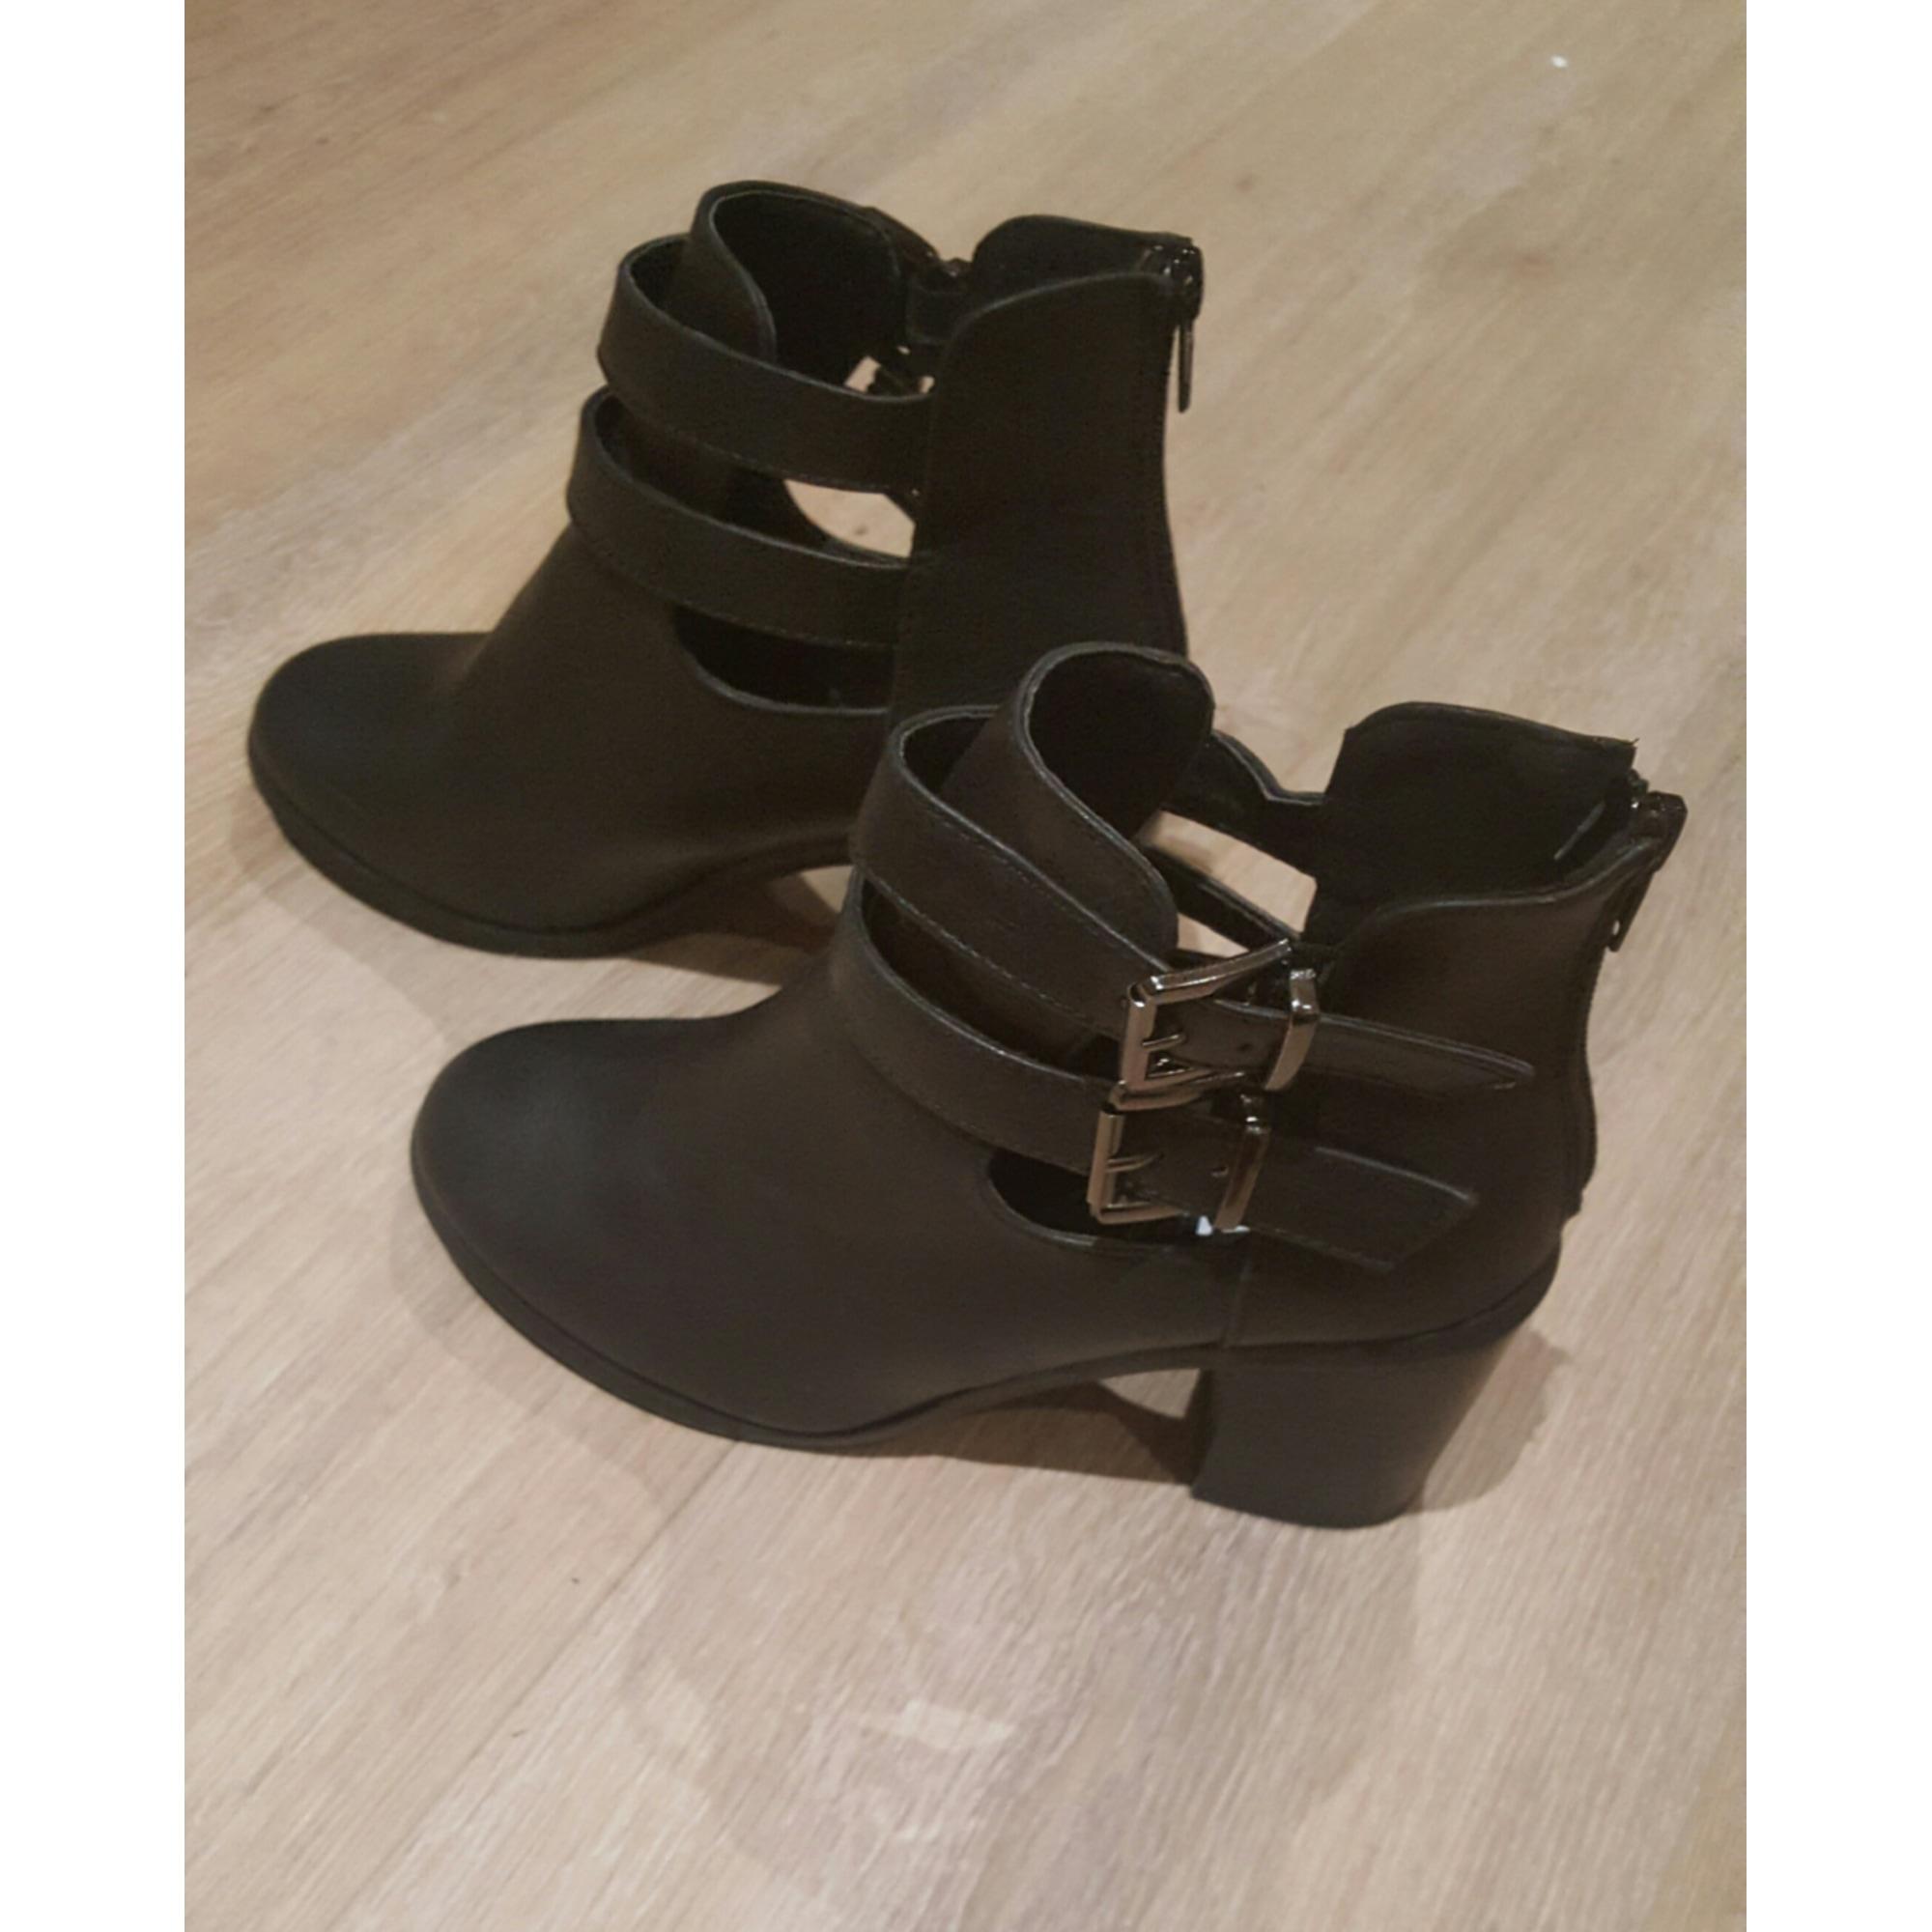 Bottines Low Boots A Talons Kiabi 37 Noir 6923980